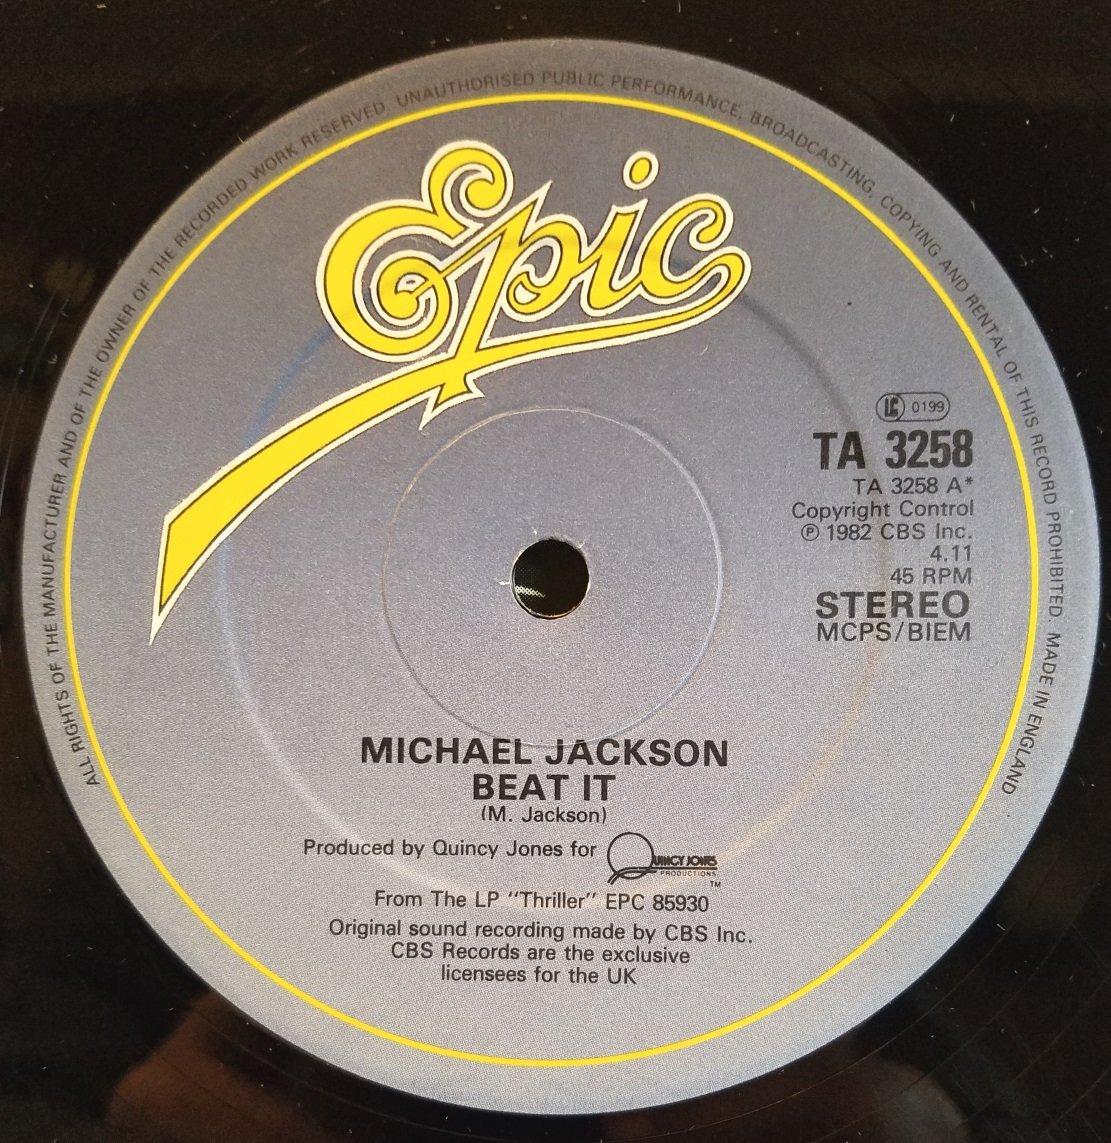 Michael Jackson - Michael Jackson - Beat It - Epic - EPCA 3184, Epic - A-3184 - Amazon.com Music